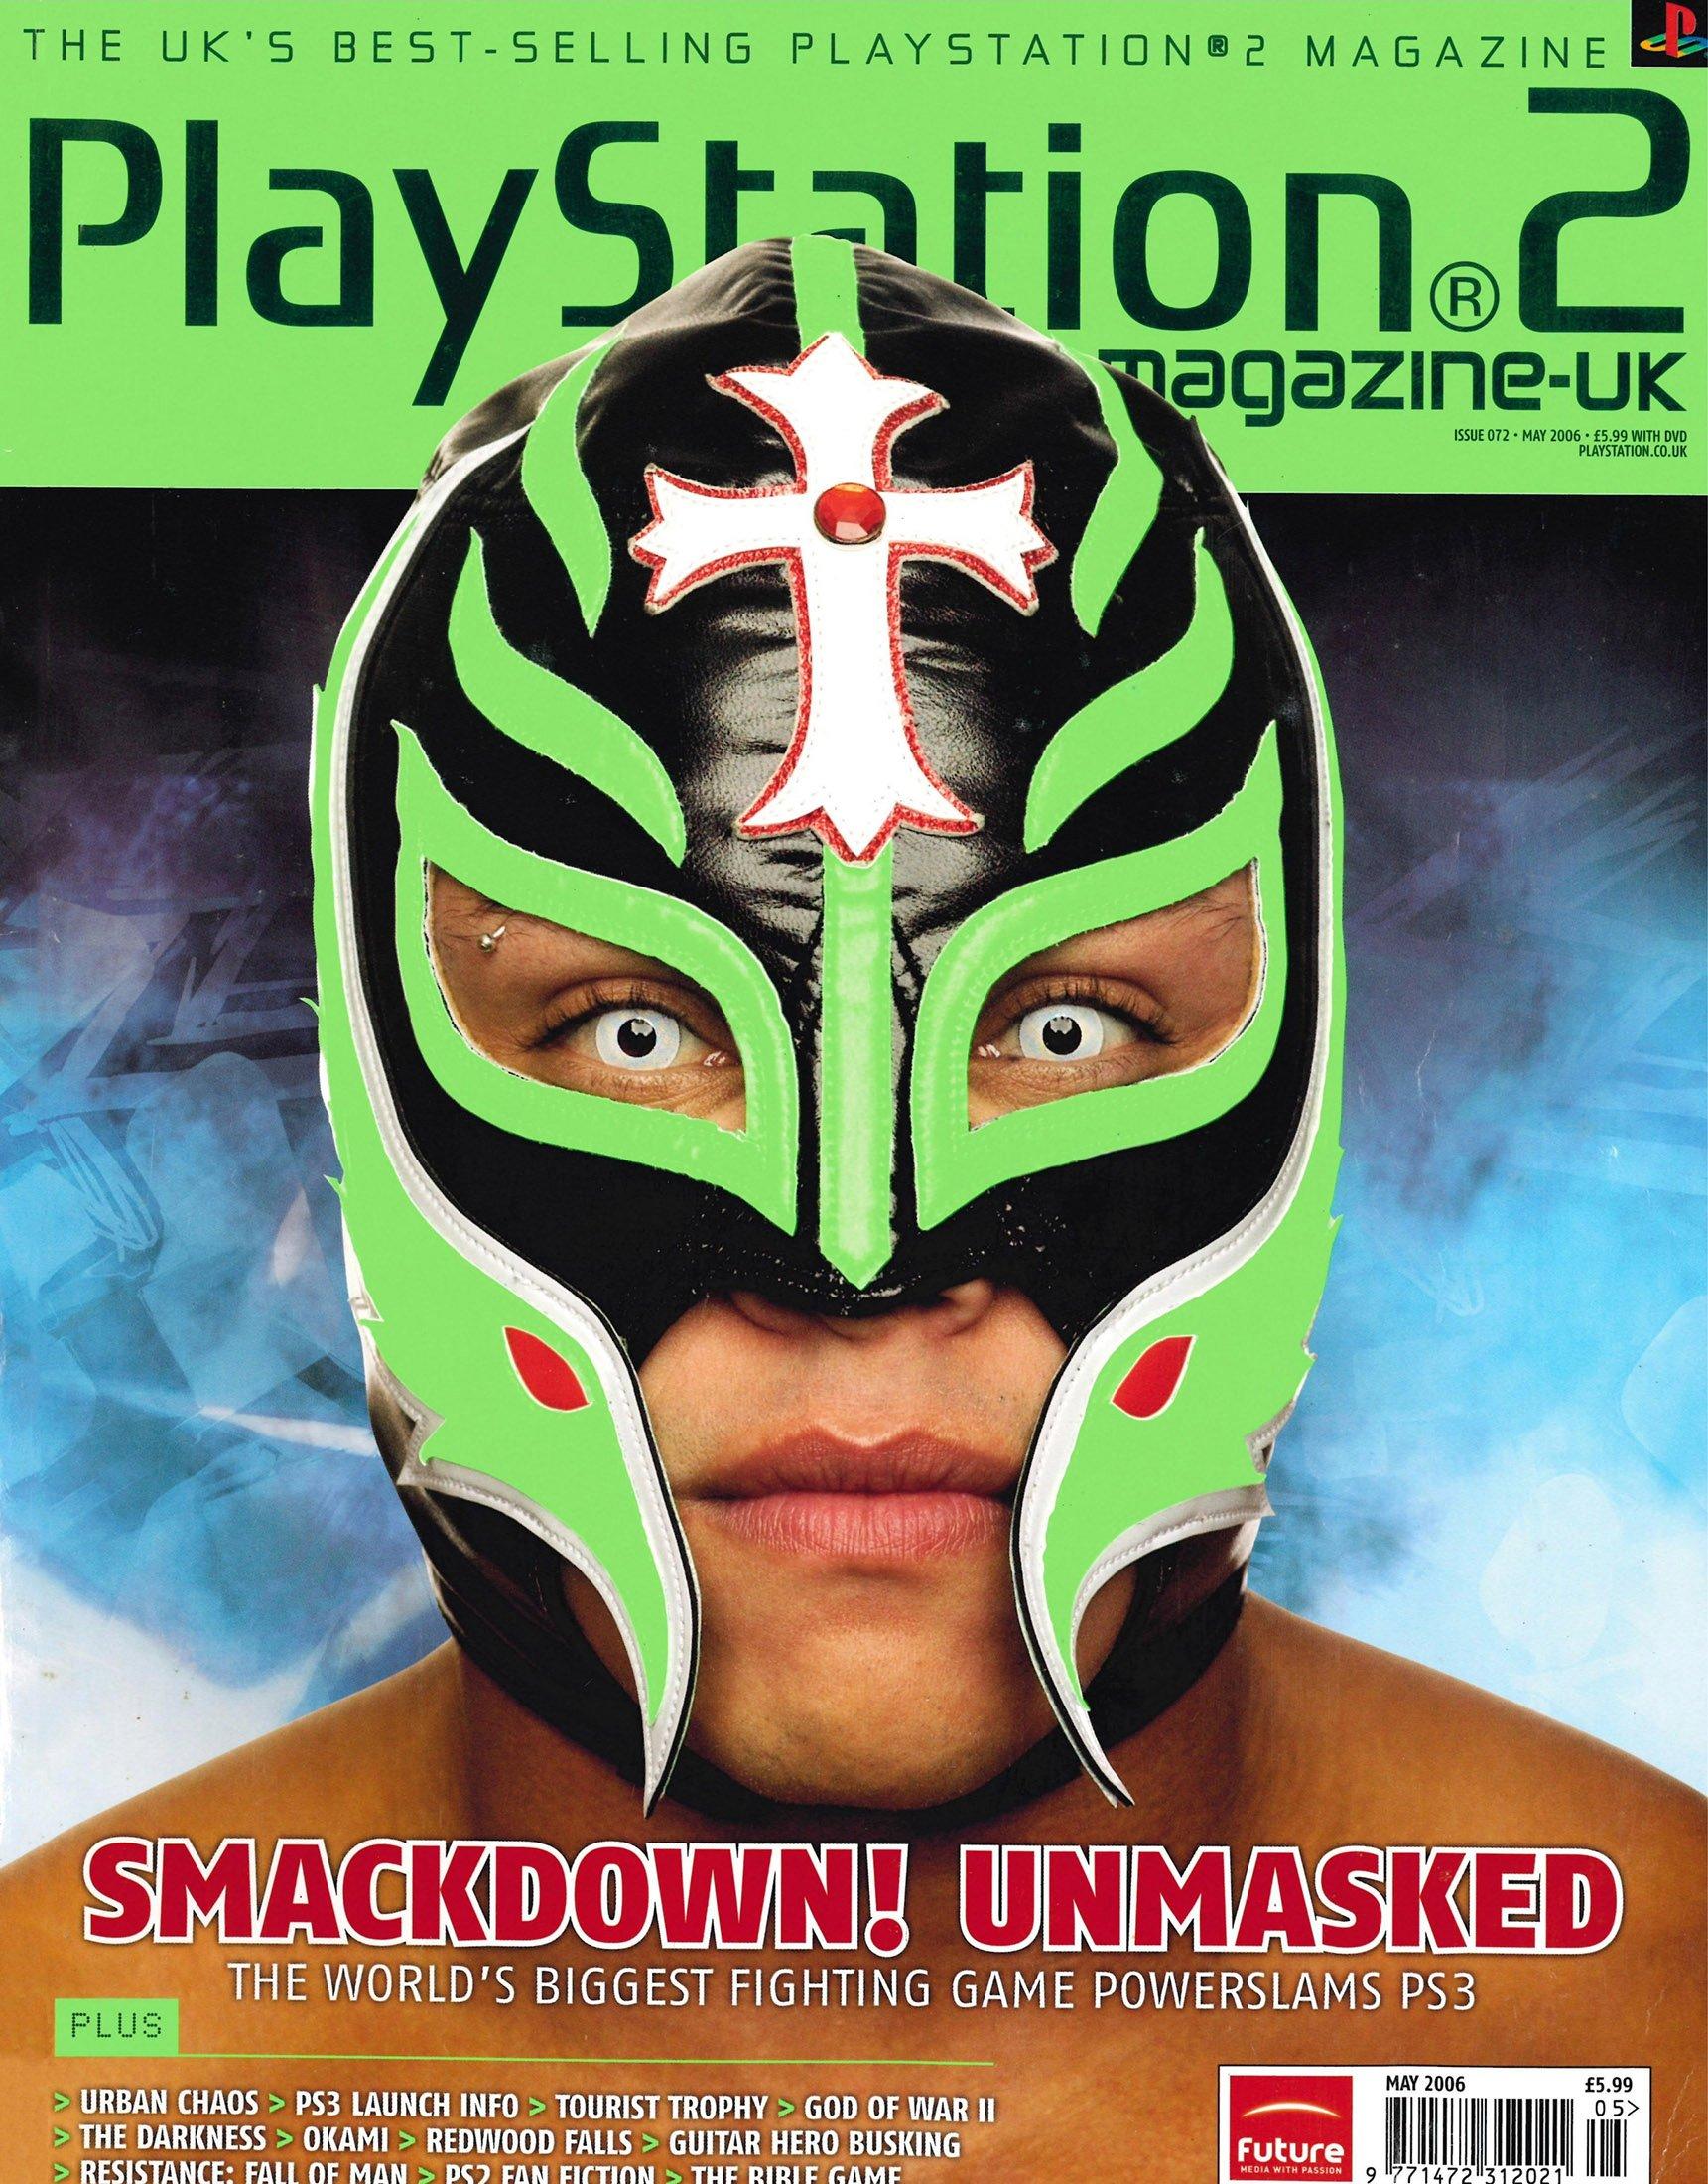 Official Playstation 2 Magazine UK 072 (May 2006)